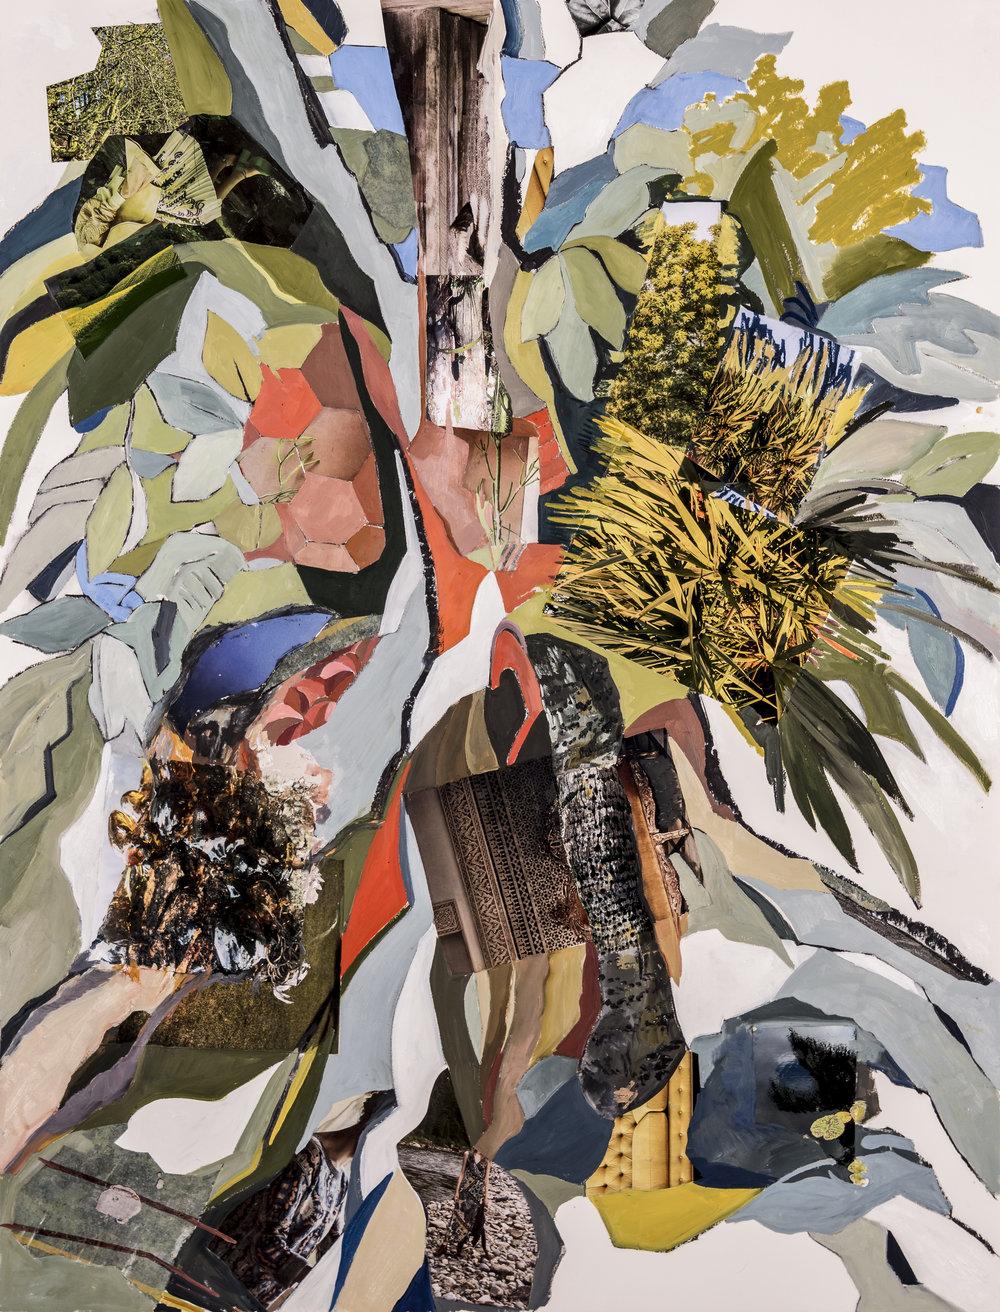 The hidden secrets of trees #VIII